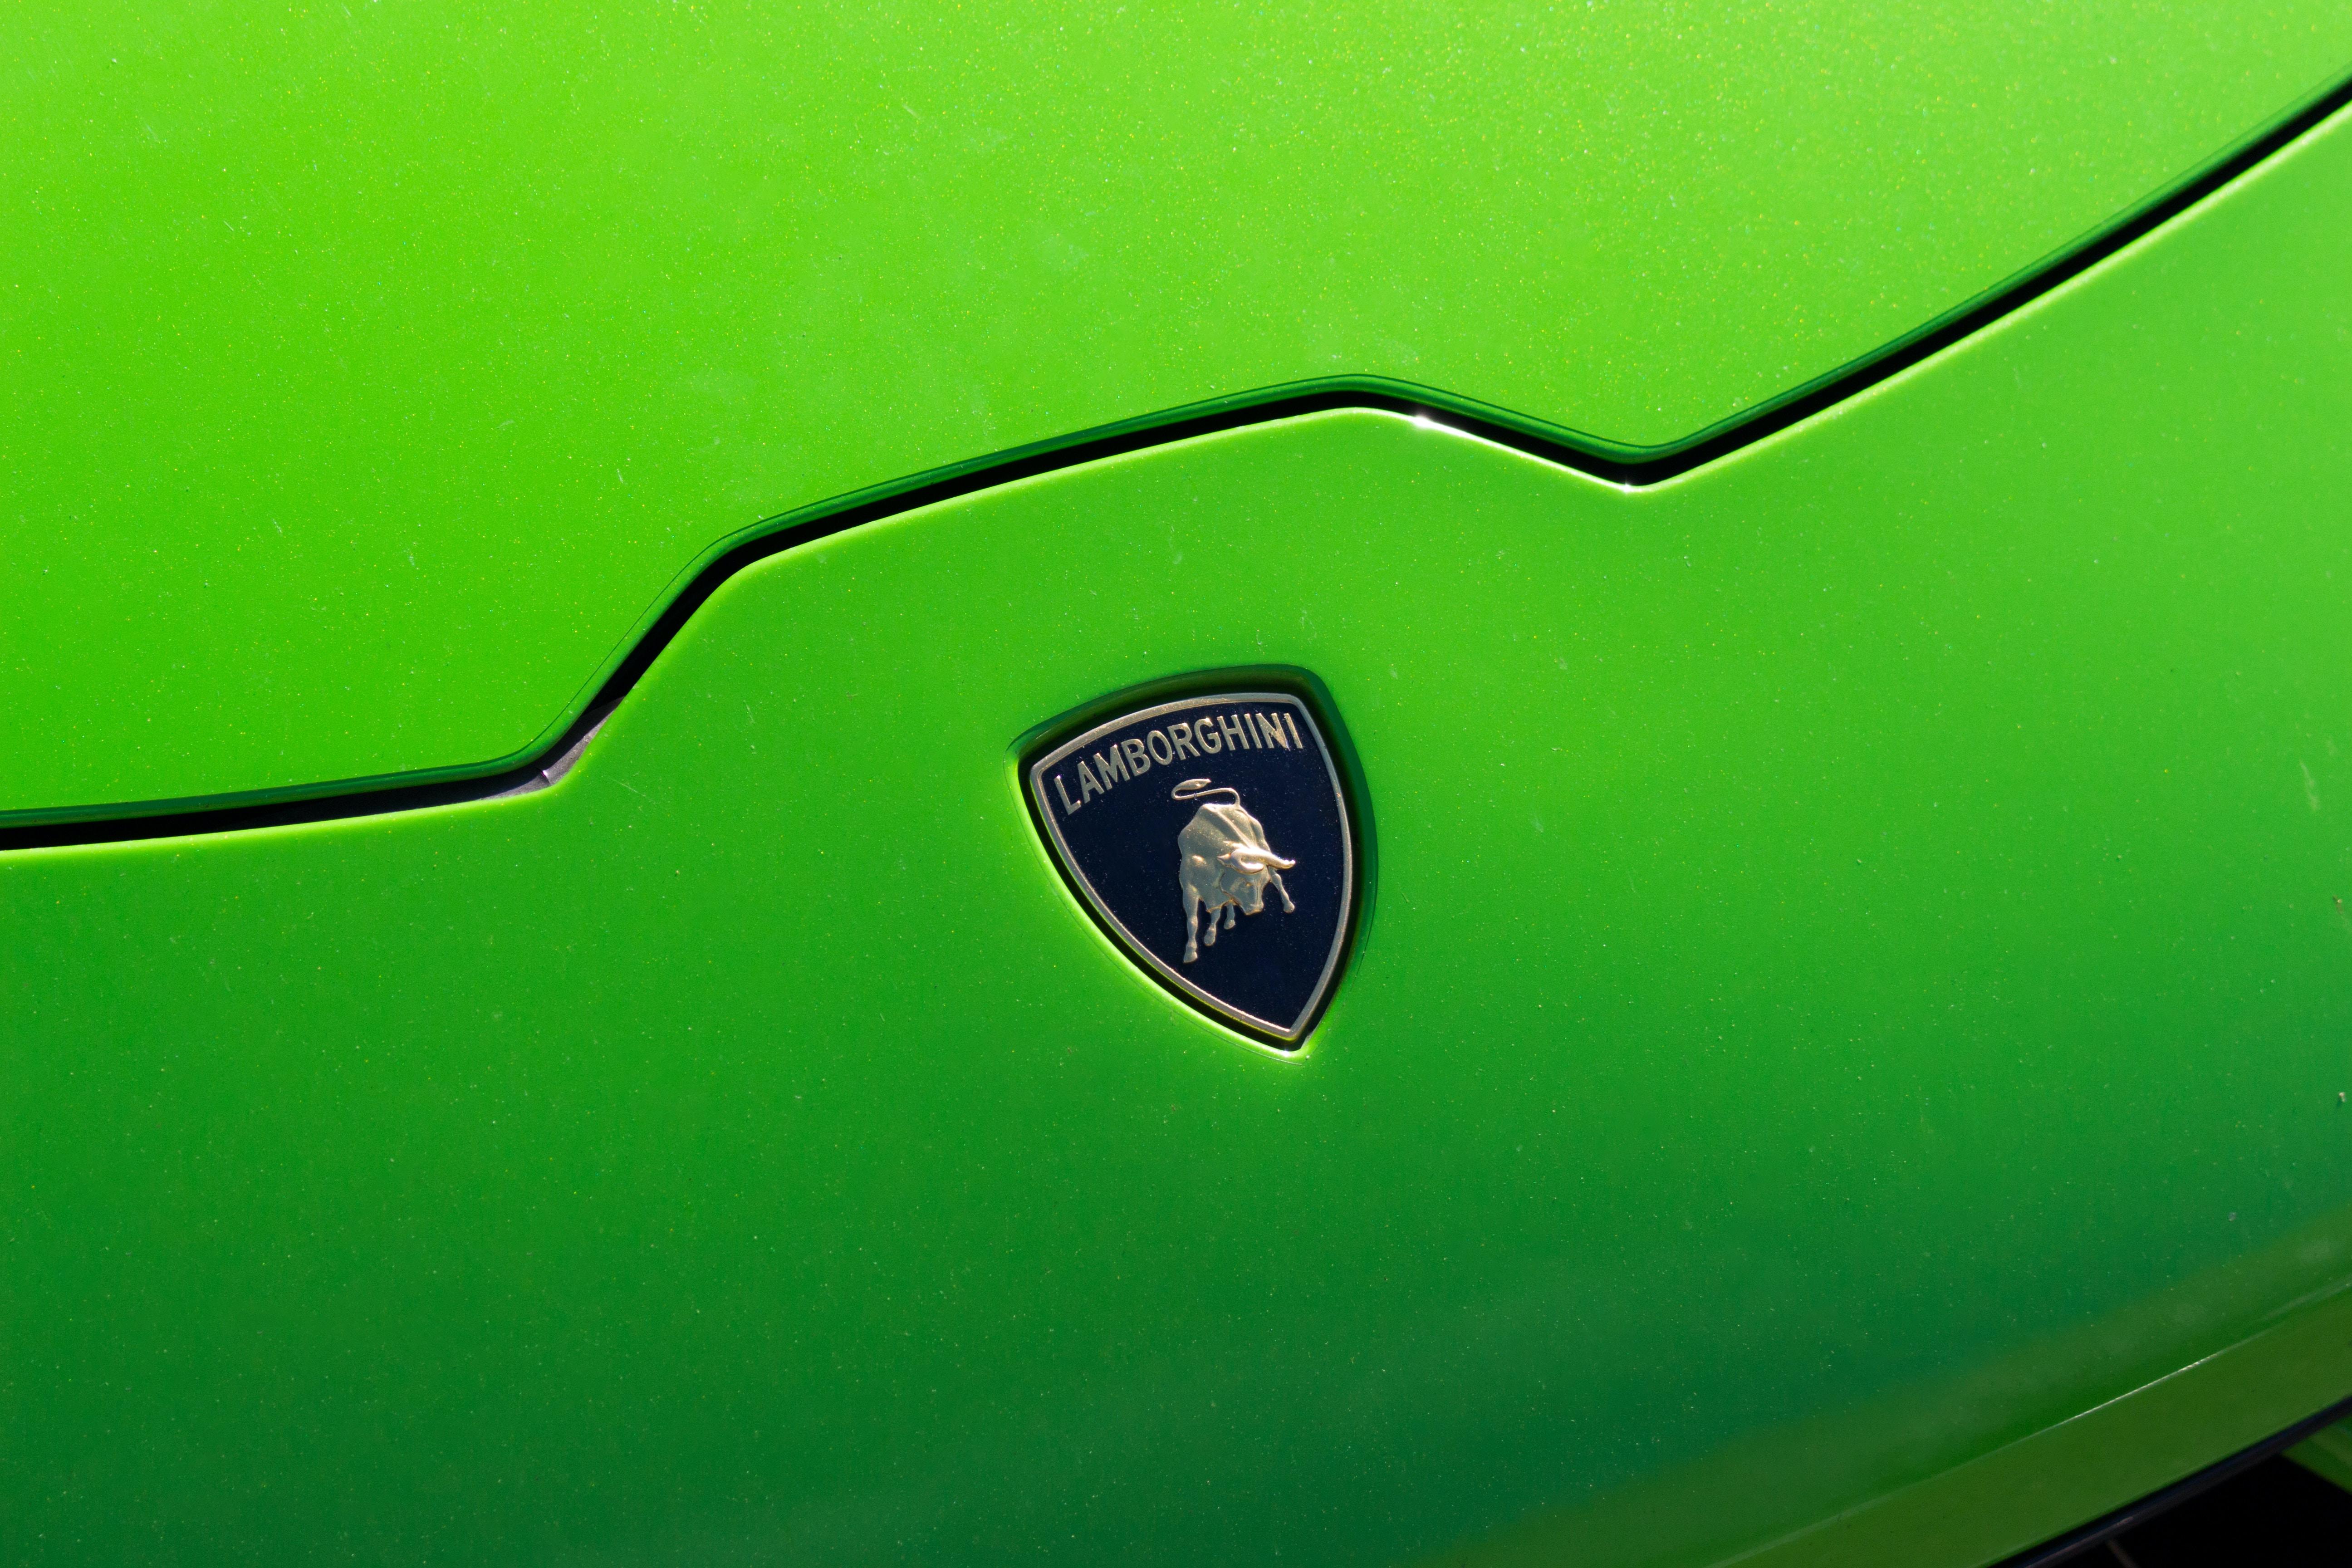 Lamborghini emblem